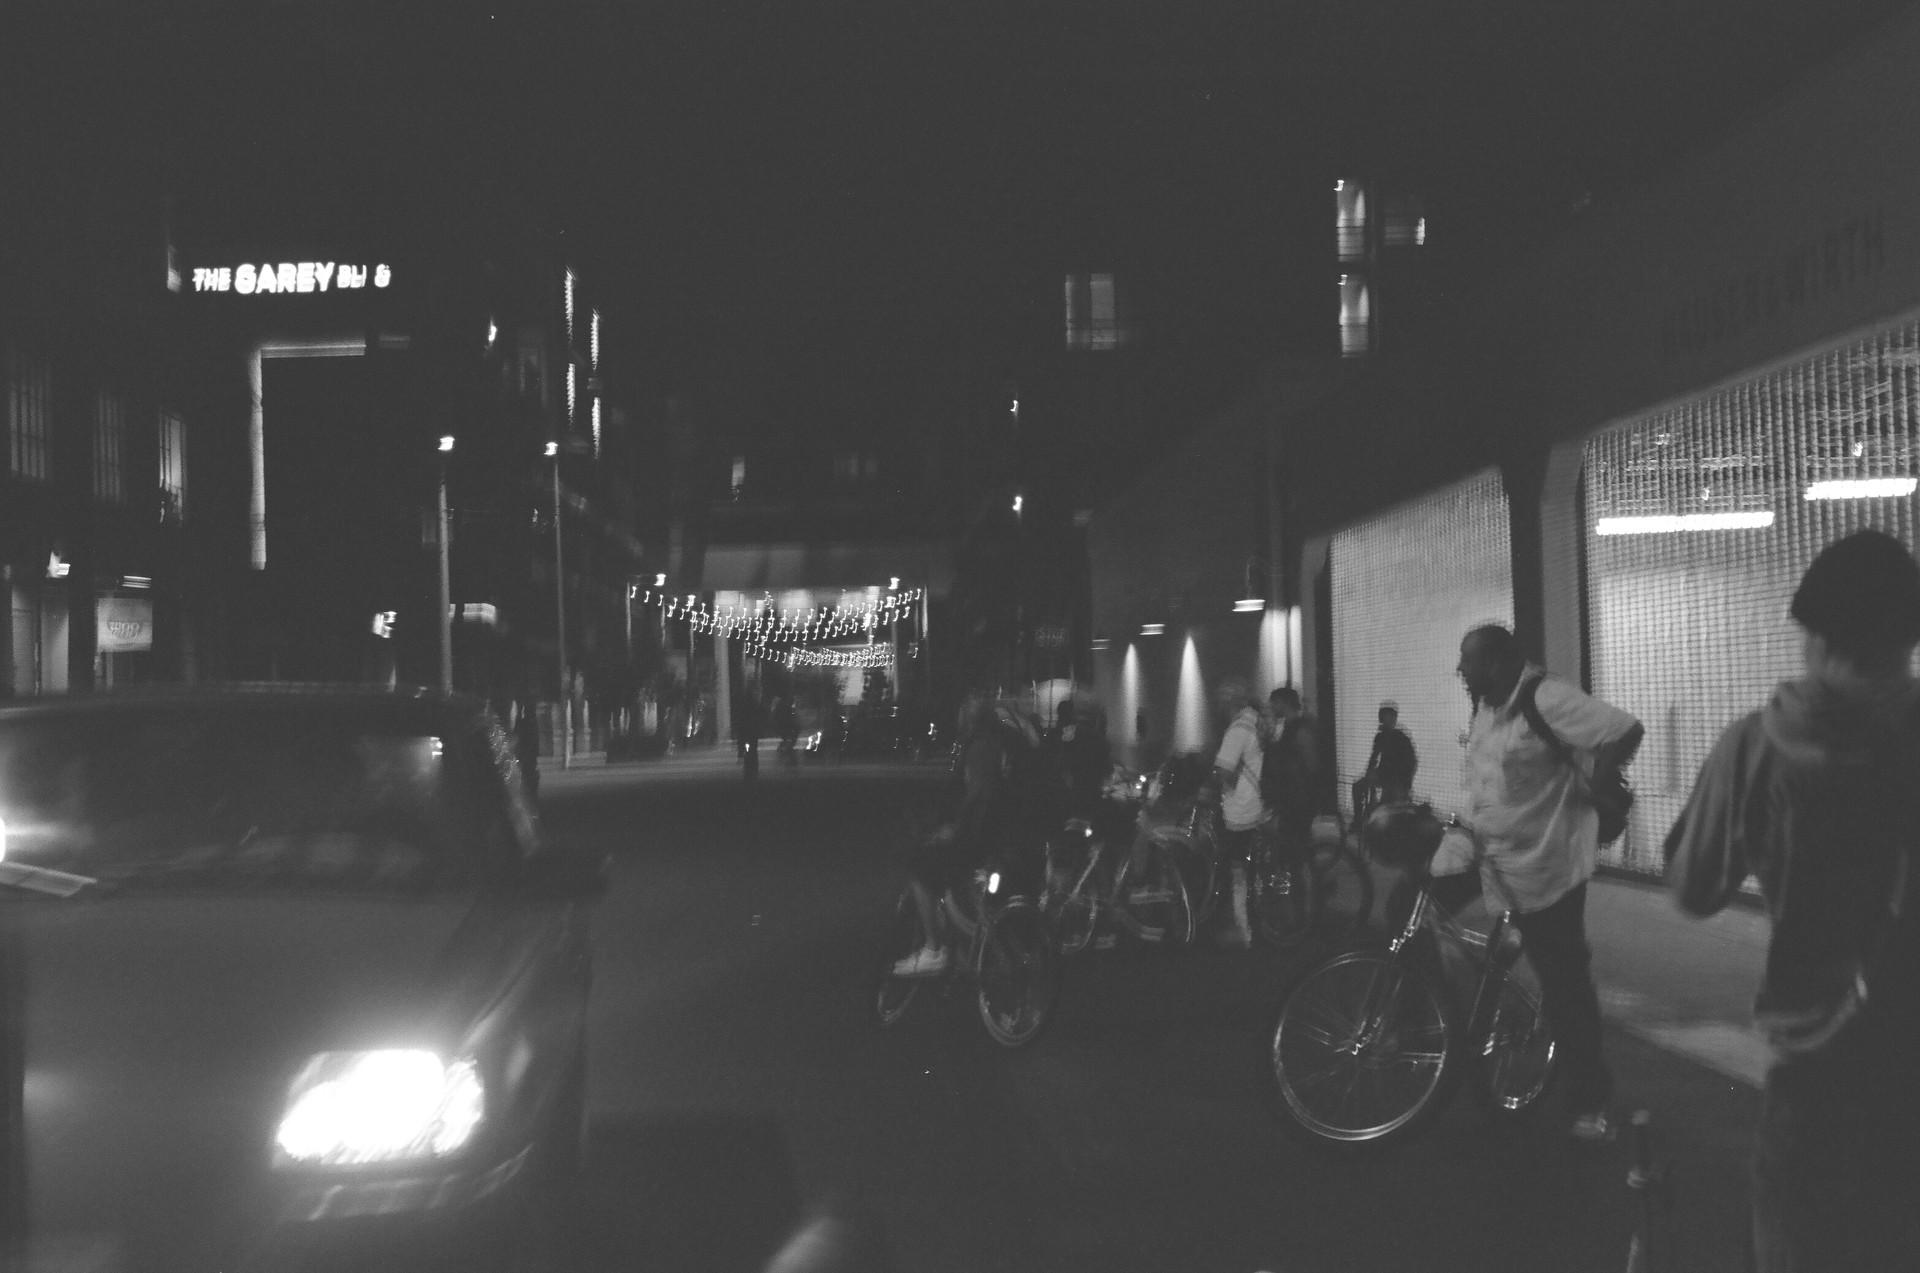 Street gangs at night